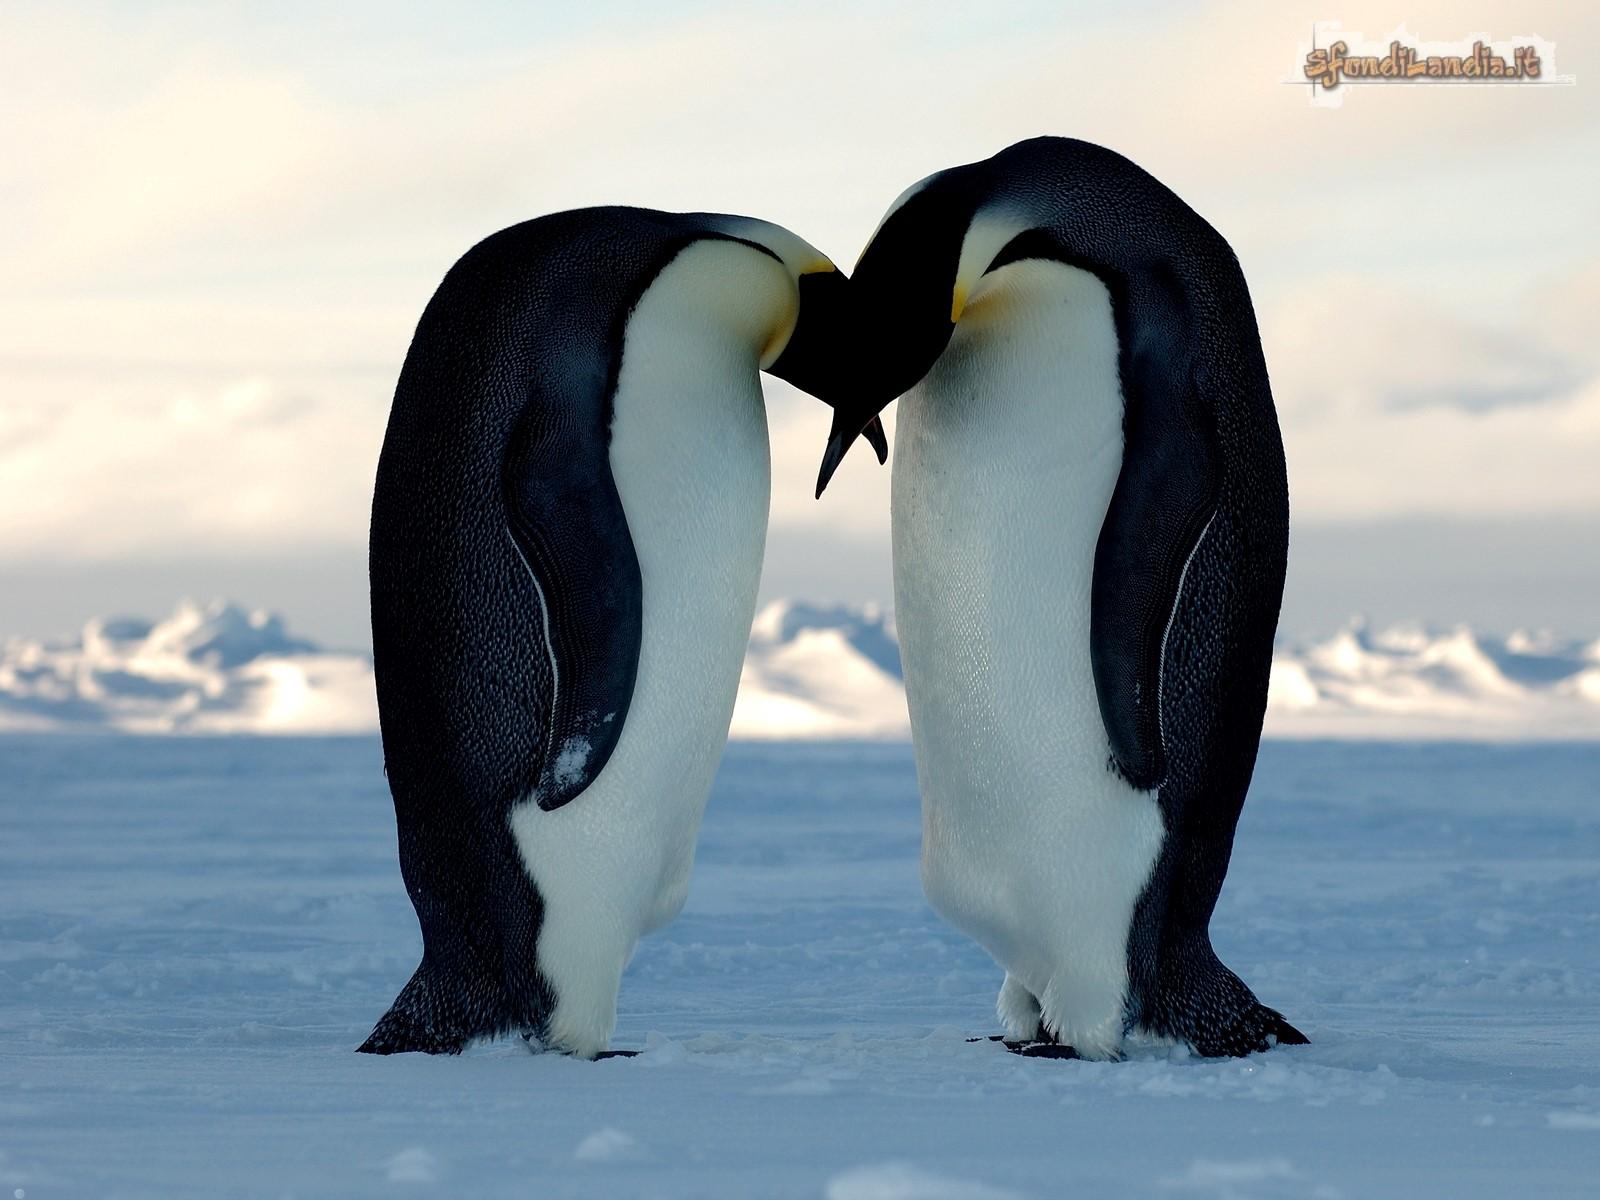 Bacio tra pinguini